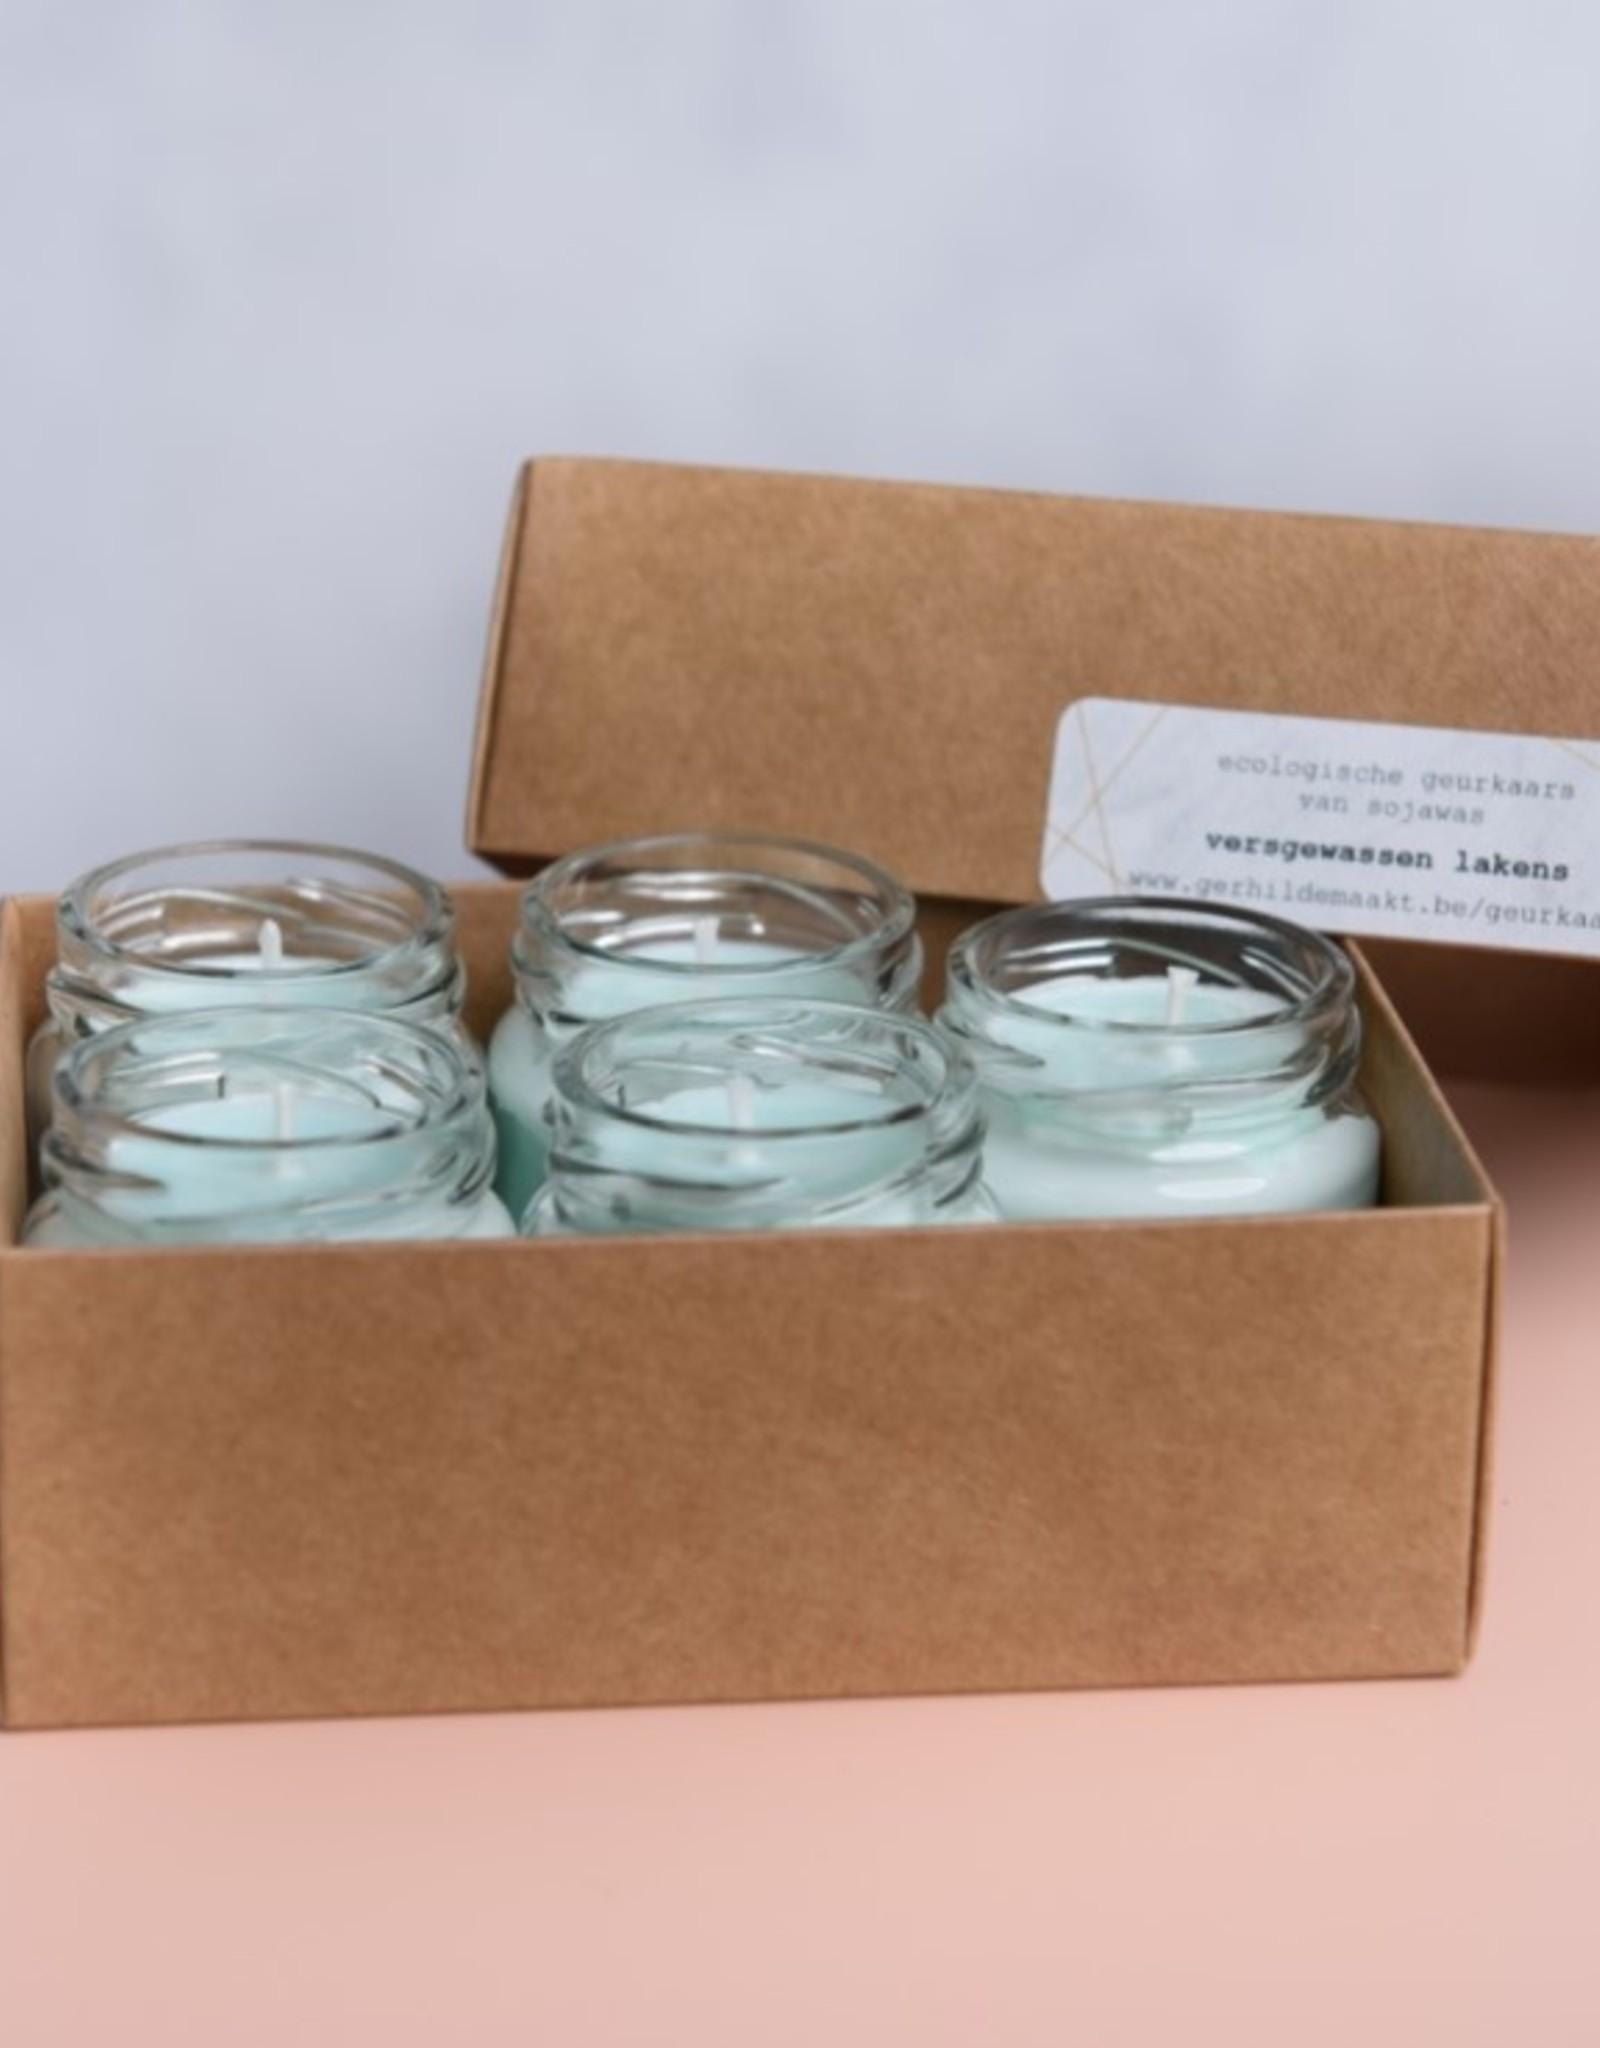 Gerhilde Candles sojawax